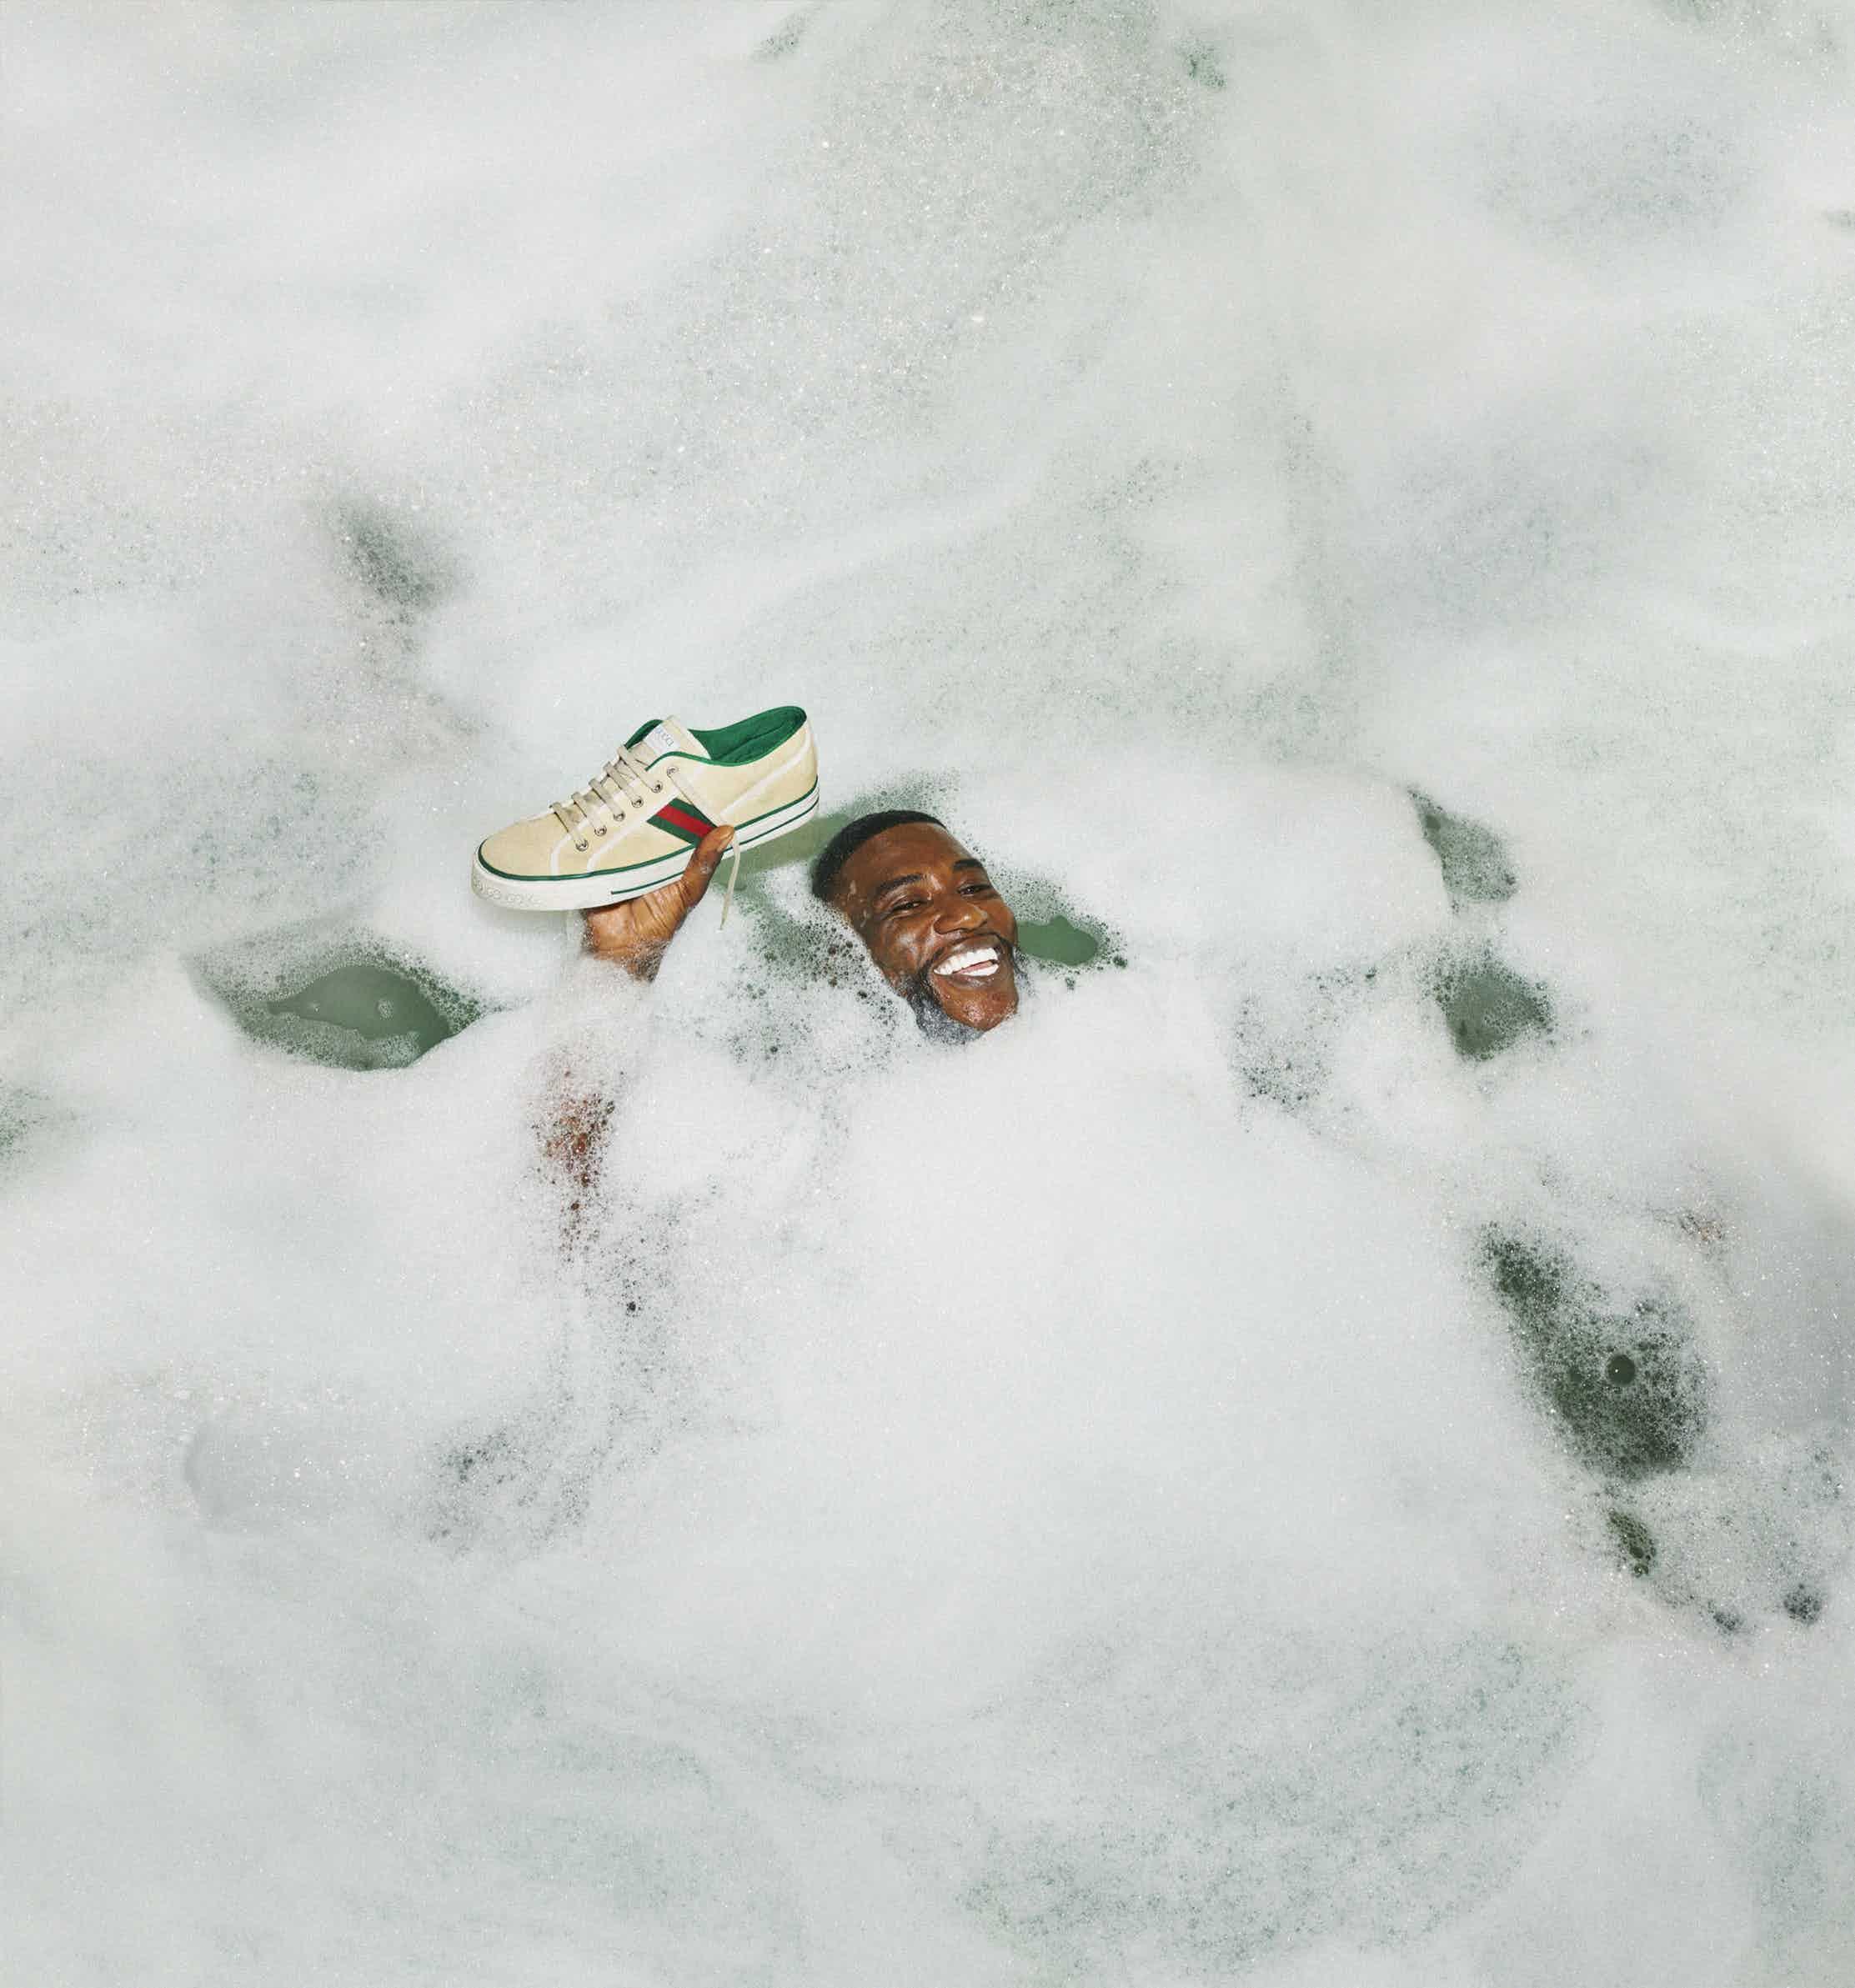 GUCCI - Gucci Cruise 2020 Photographer: Harmony Korine Stylist: Alessandro Michele Location: Rome